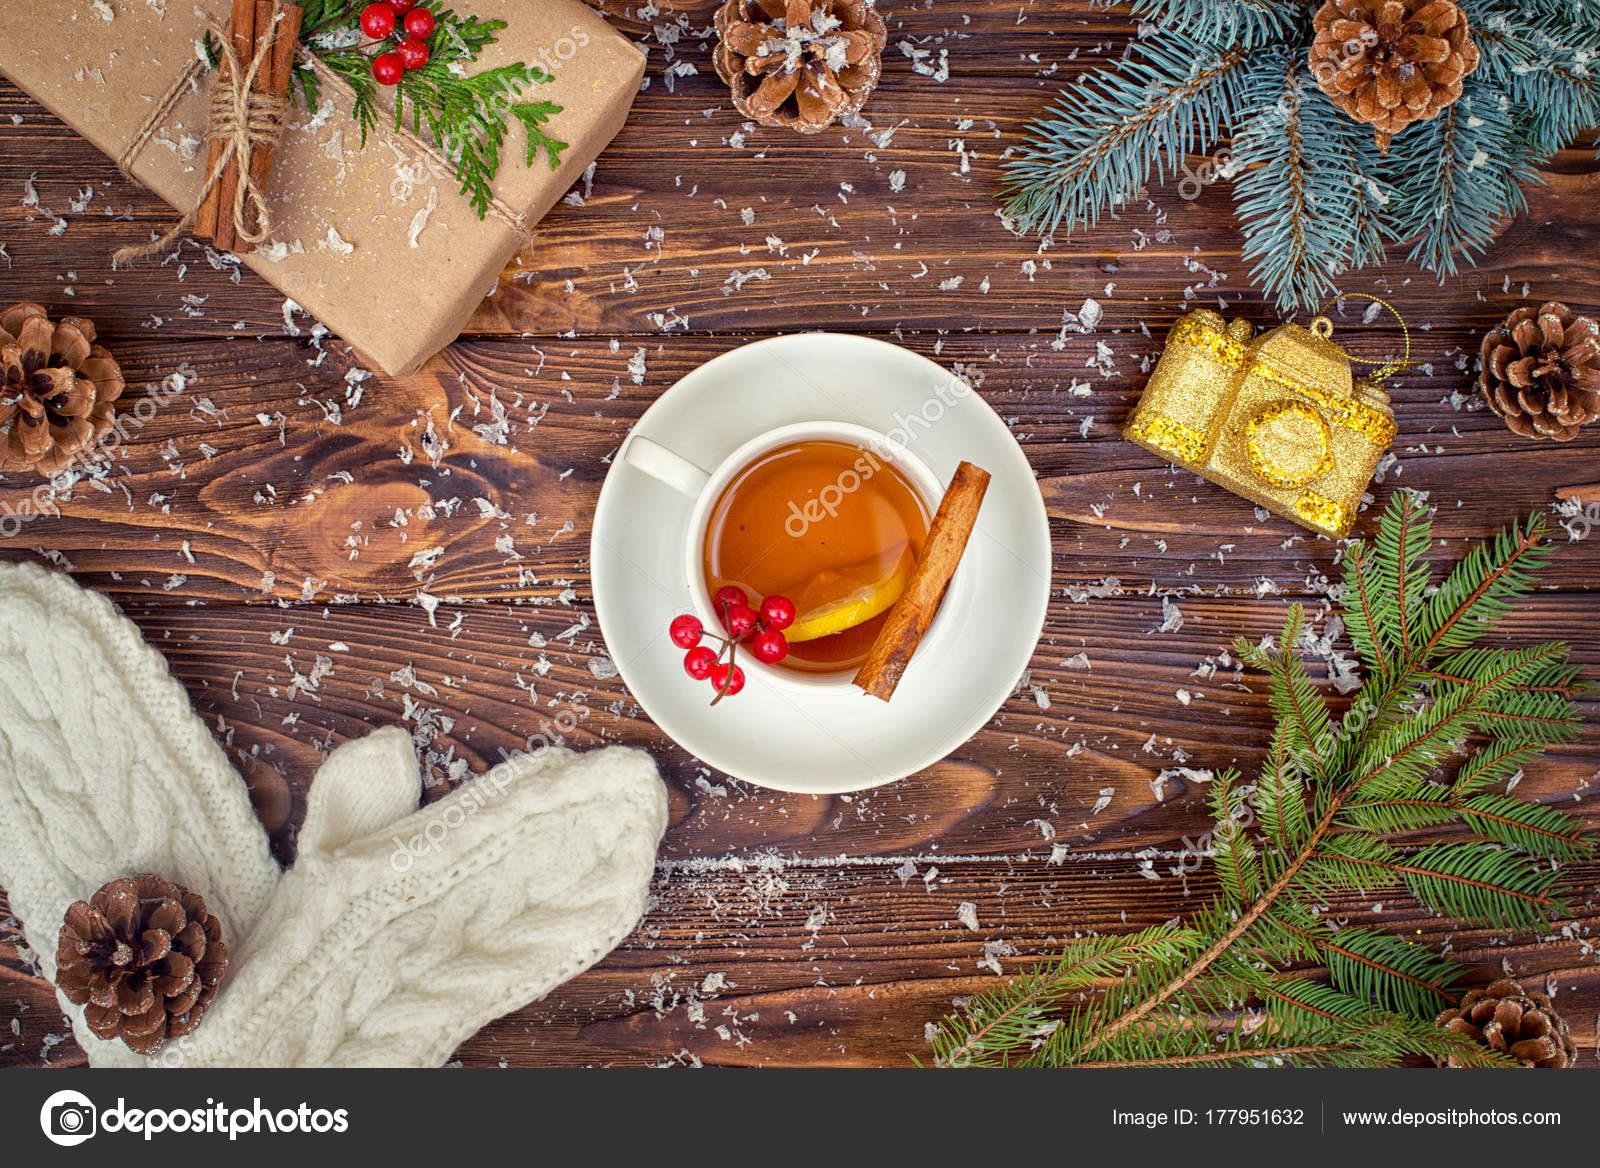 Wooden Background Christmas Decorations Cup Hot Tea Lemon